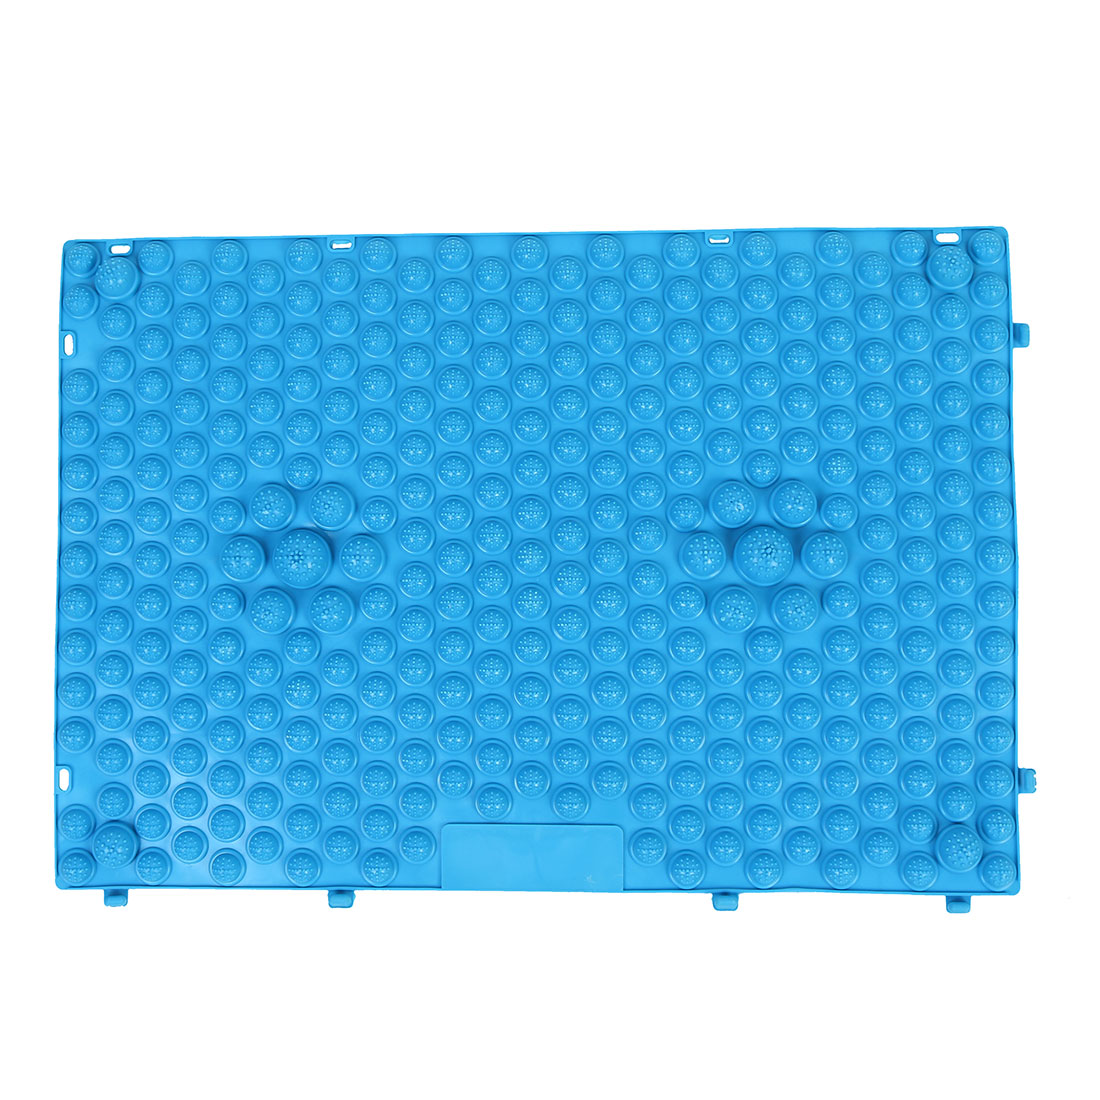 Outdoor Leisure Game Rubber Acupuncture Foot Massage Mat Shiatsu Sheet Blue